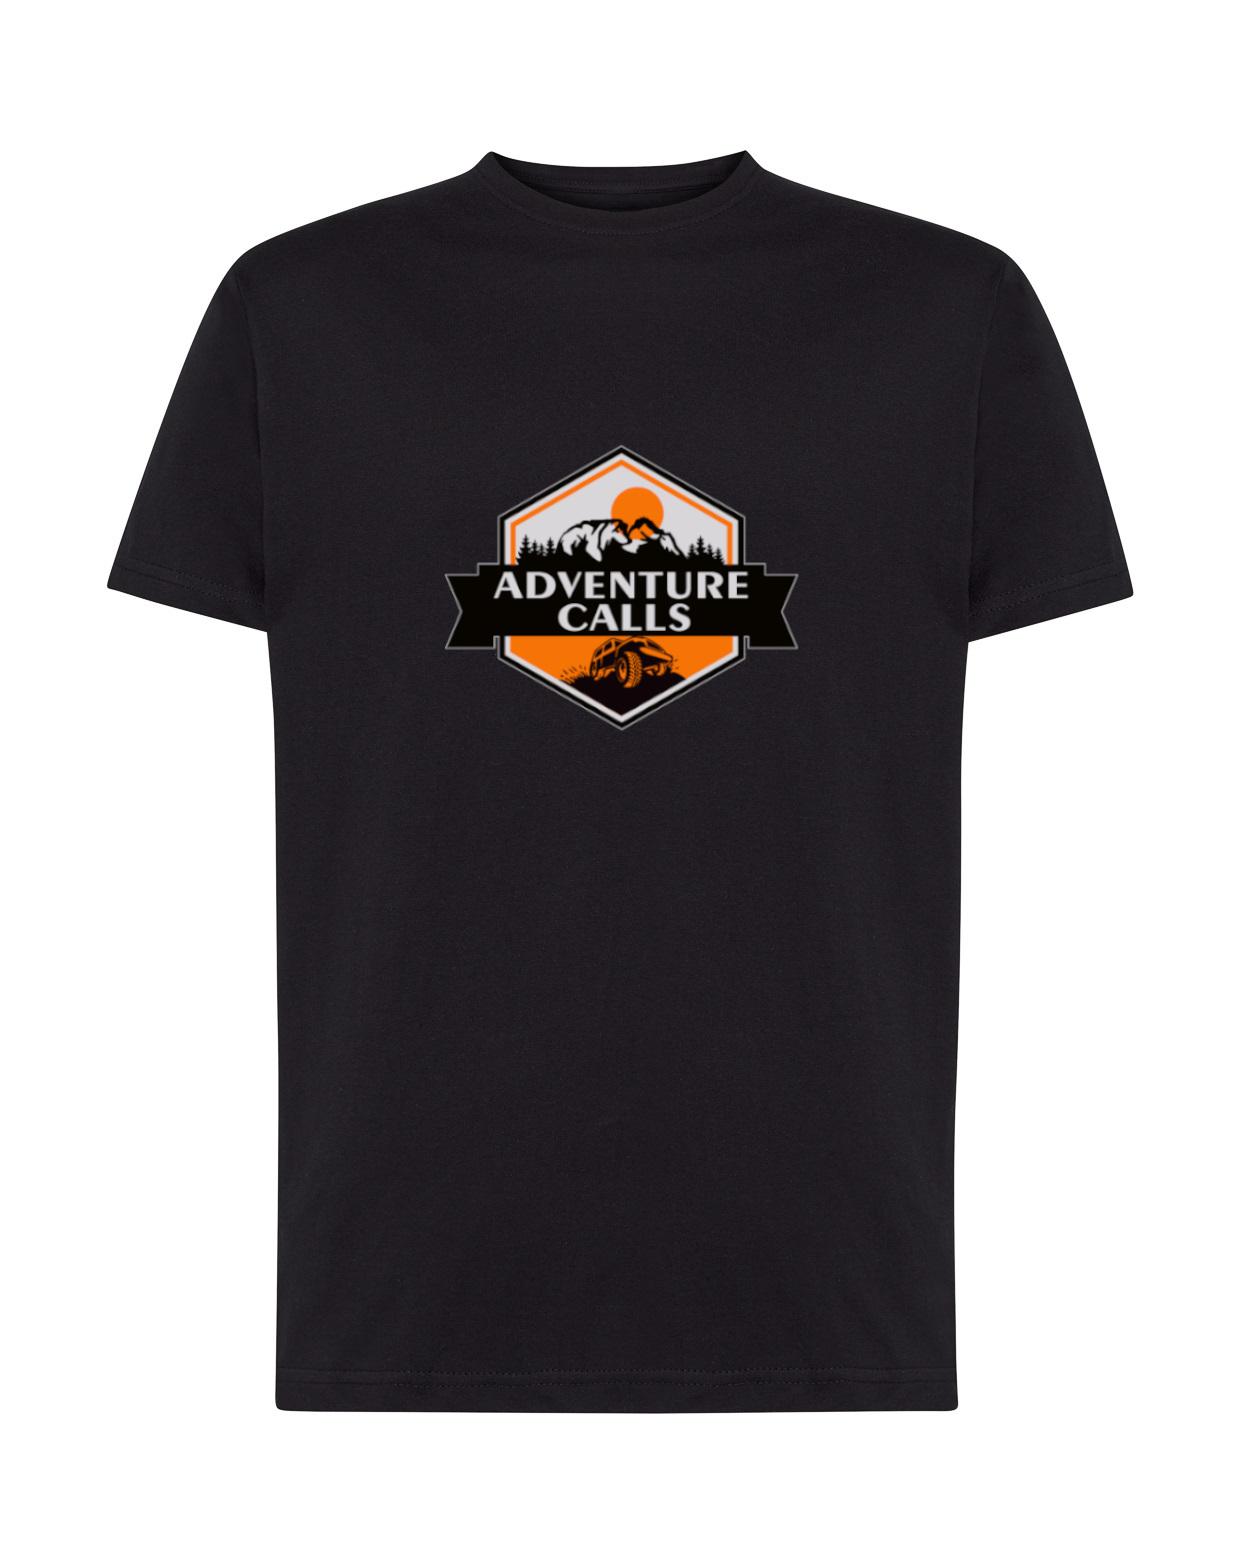 tshirt_adventure calls